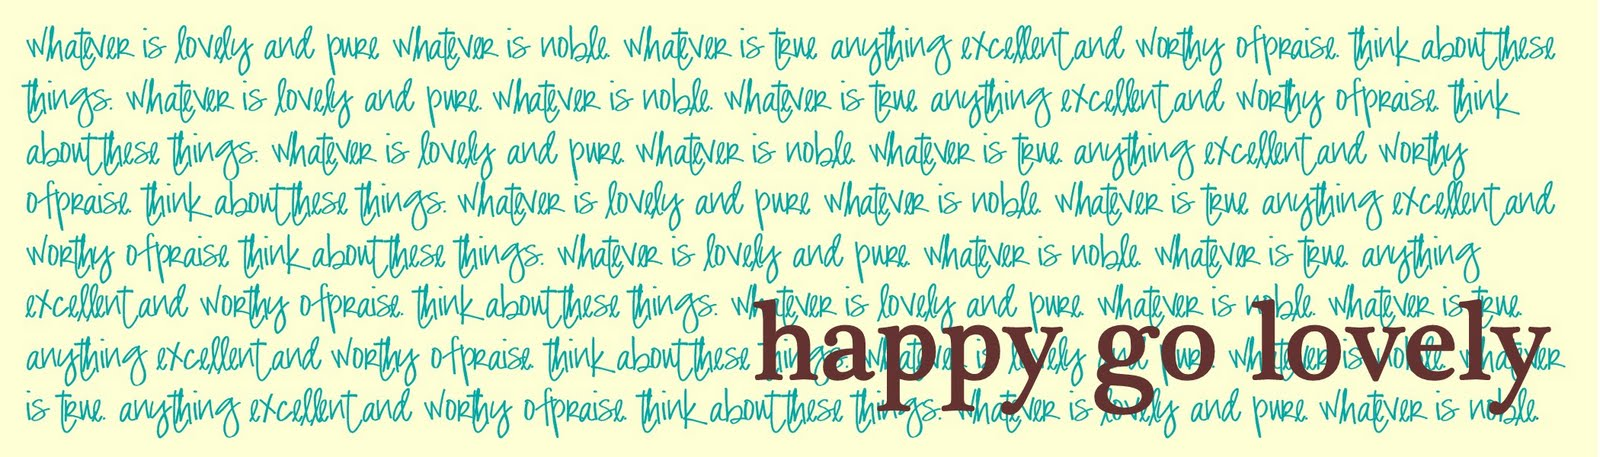 Happy Go Lovely